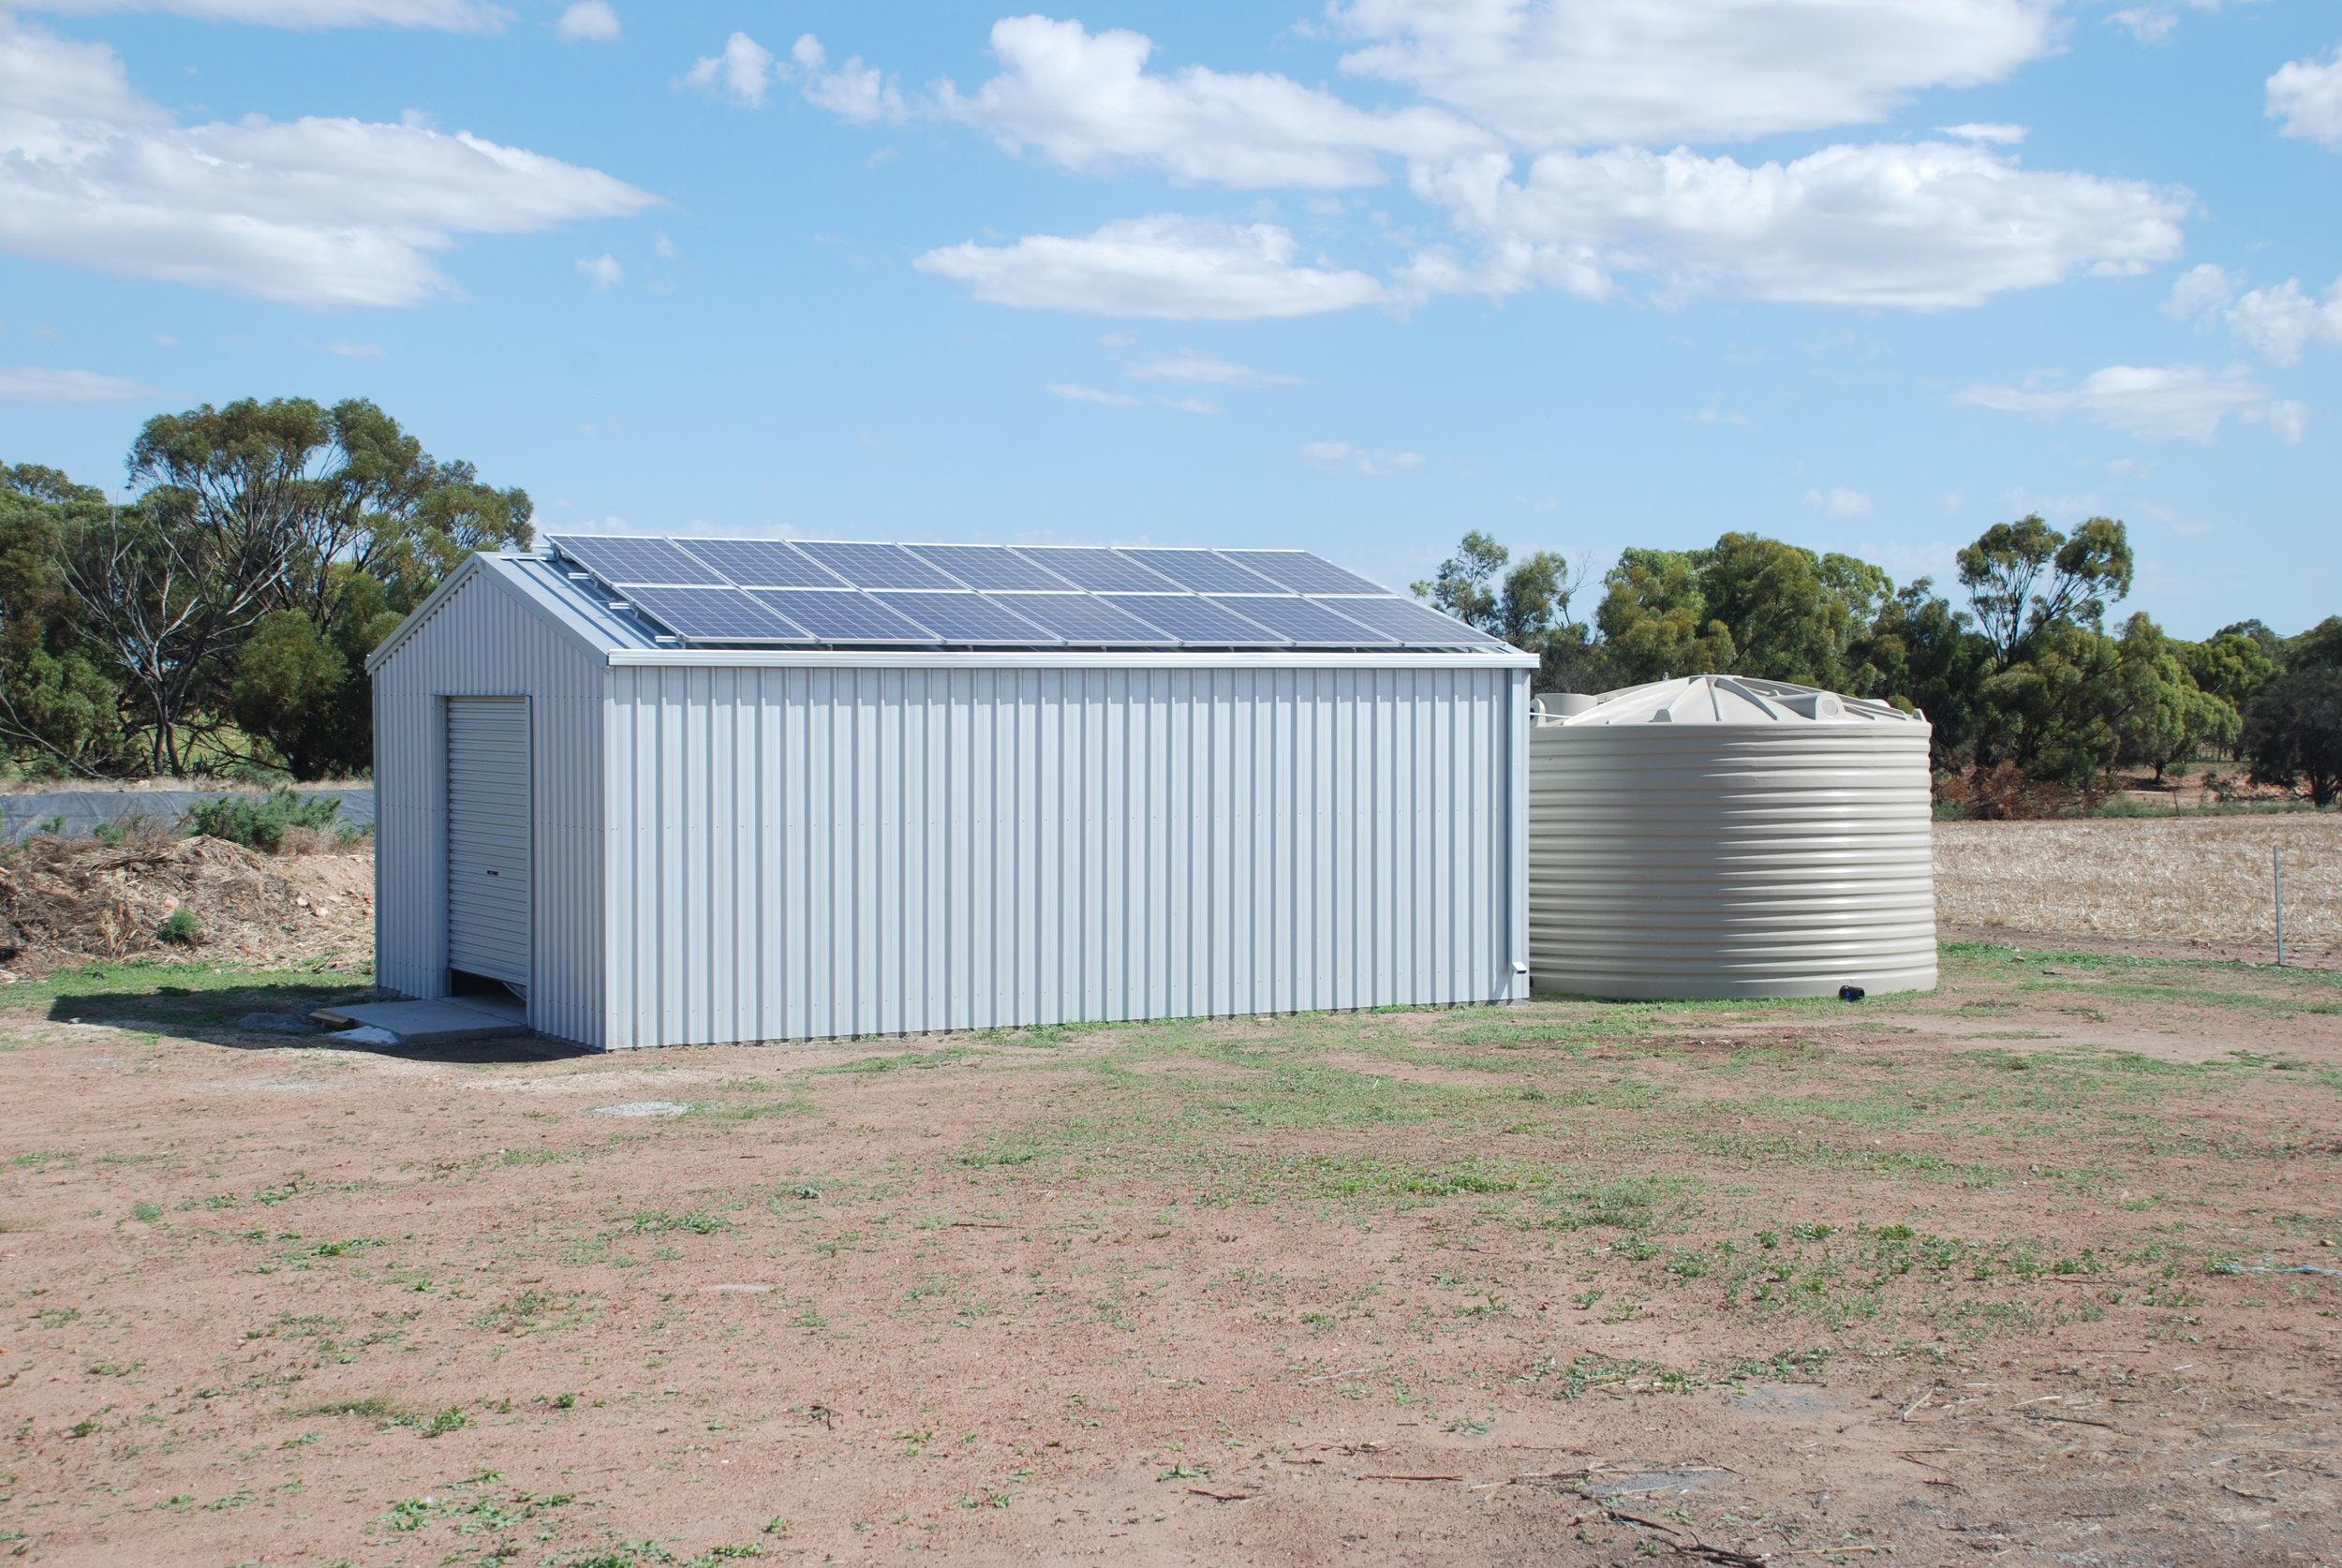 Cranmore Park's plant is housed under solar panels, taking full advantage of Western Australia'a abundant sunshine.